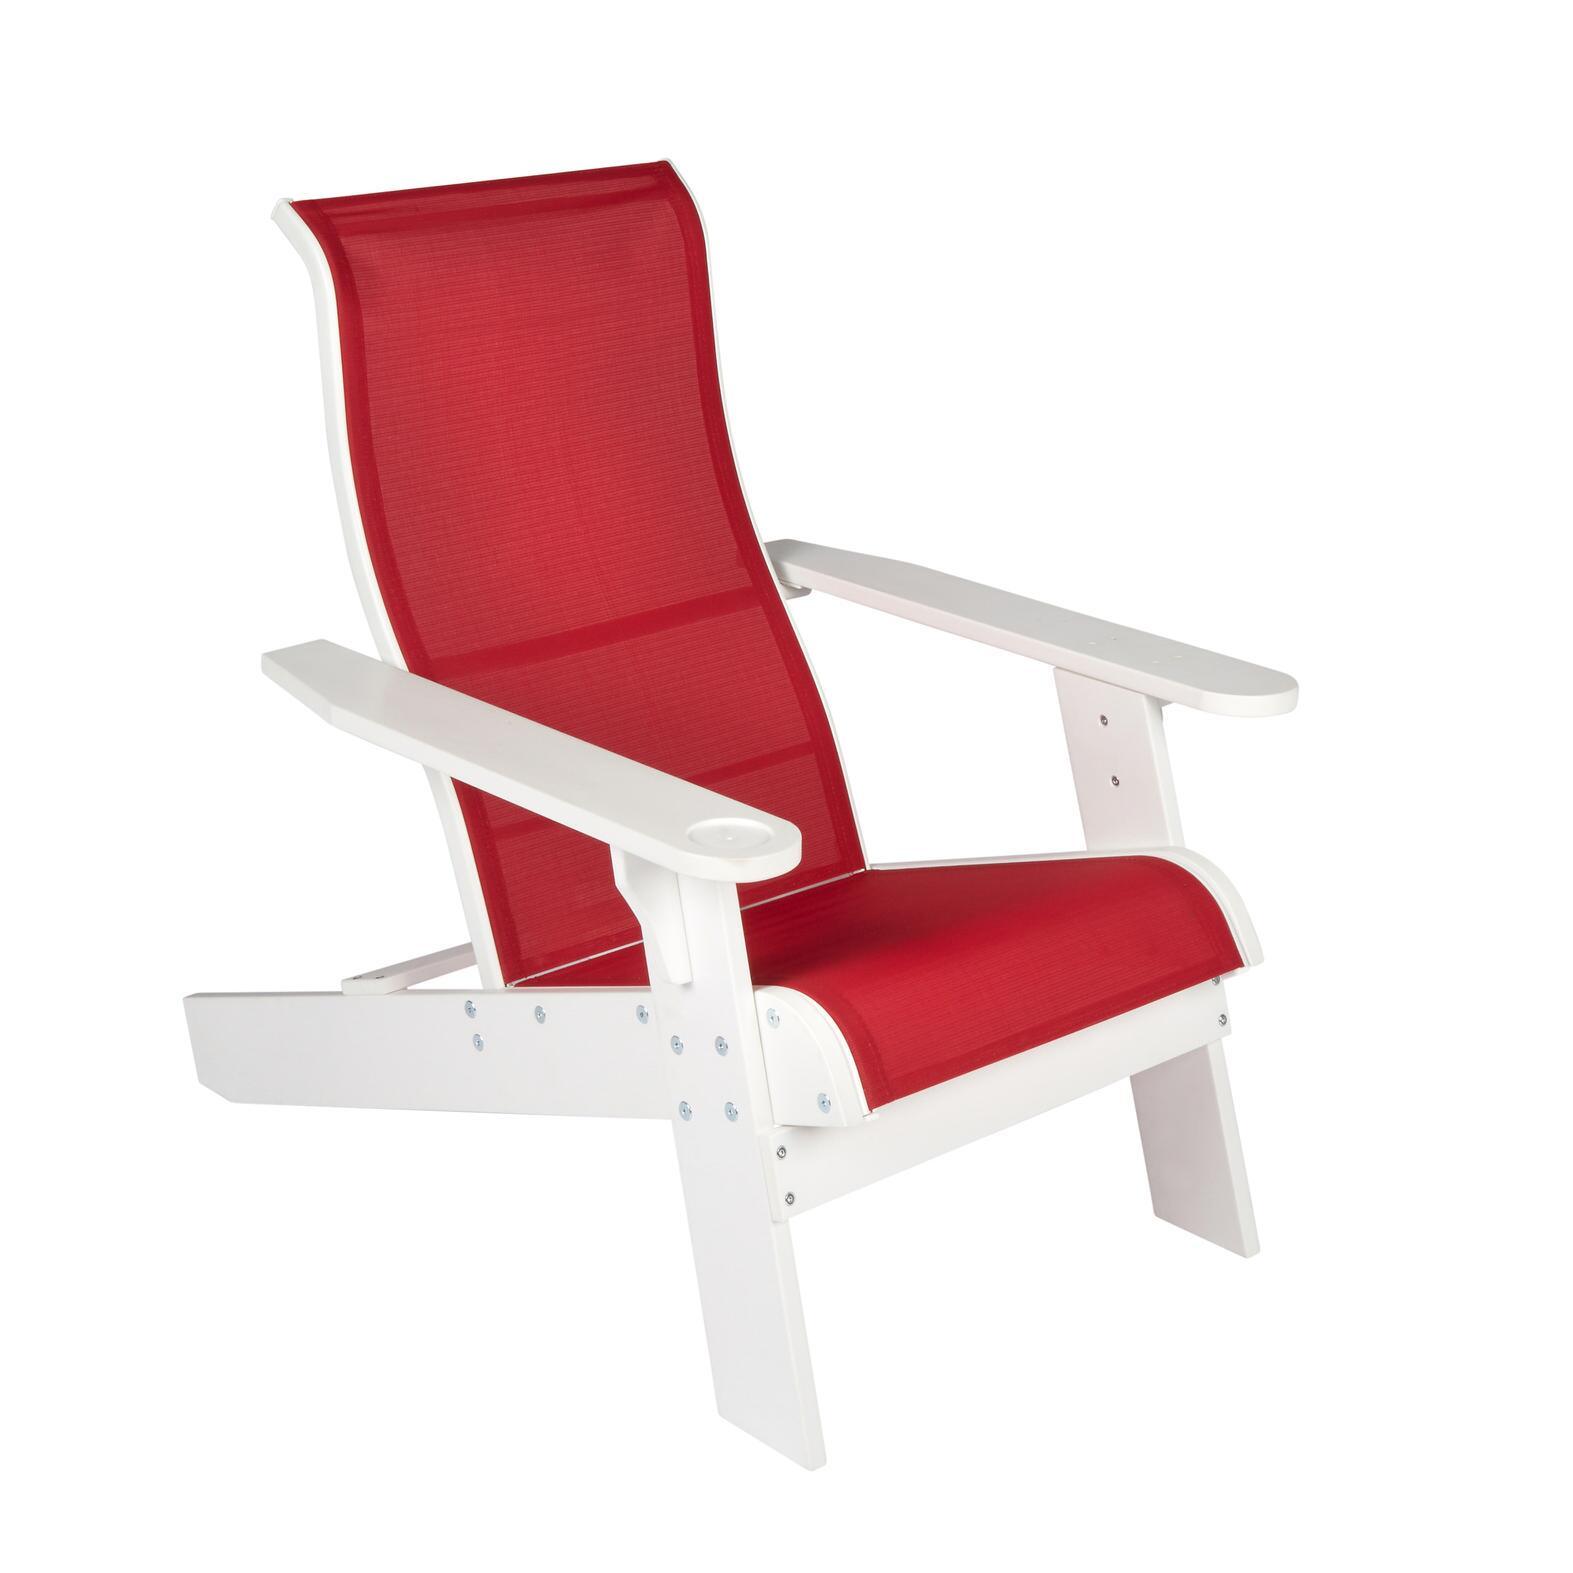 Coastal Living Seascapesu0026trade; Adirondack Chair